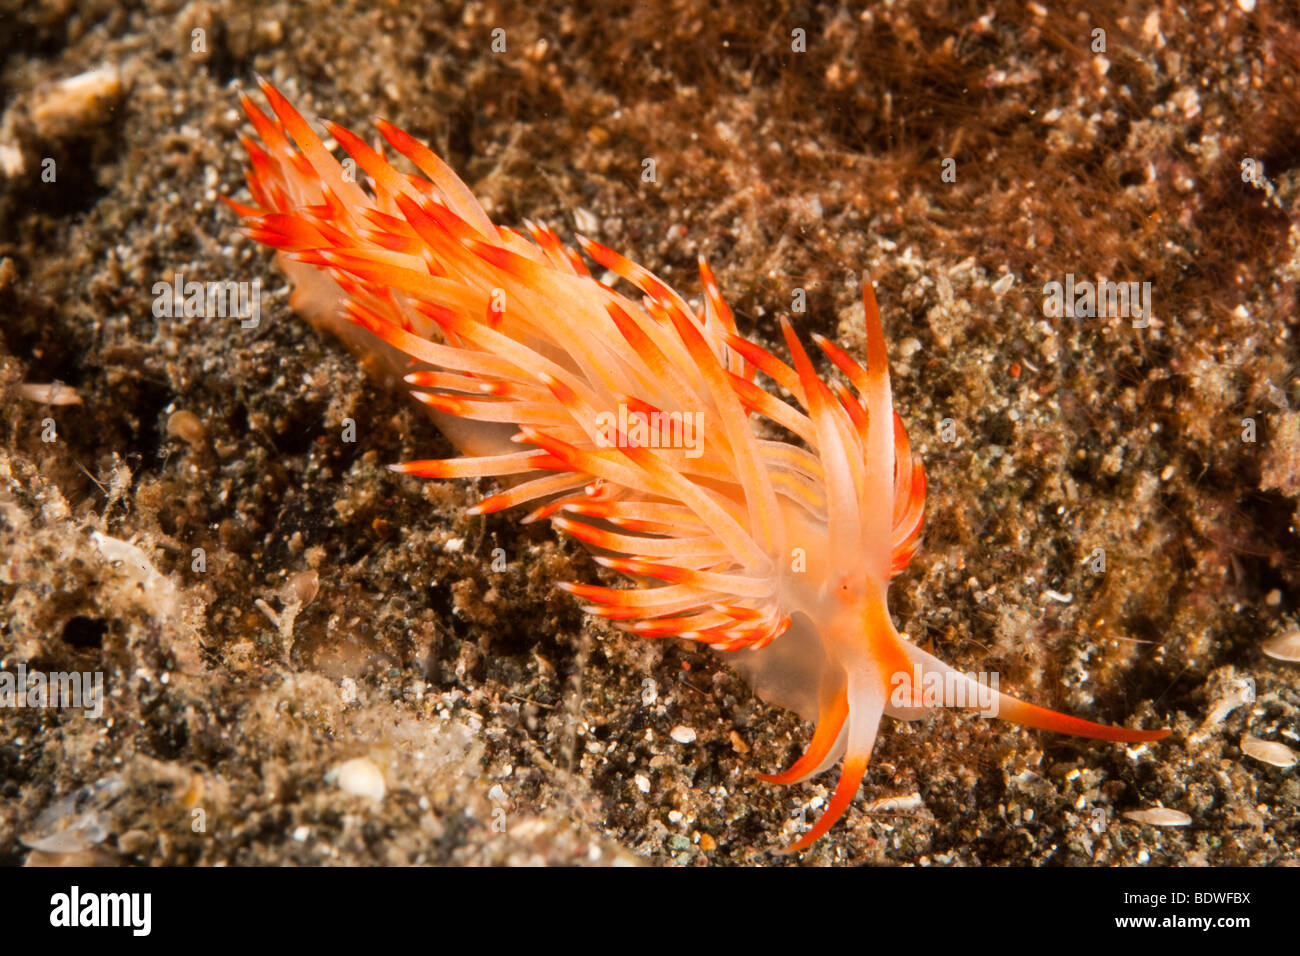 Nudibranch or seaslug (Flabellina sp), Indonesia - Stock Image